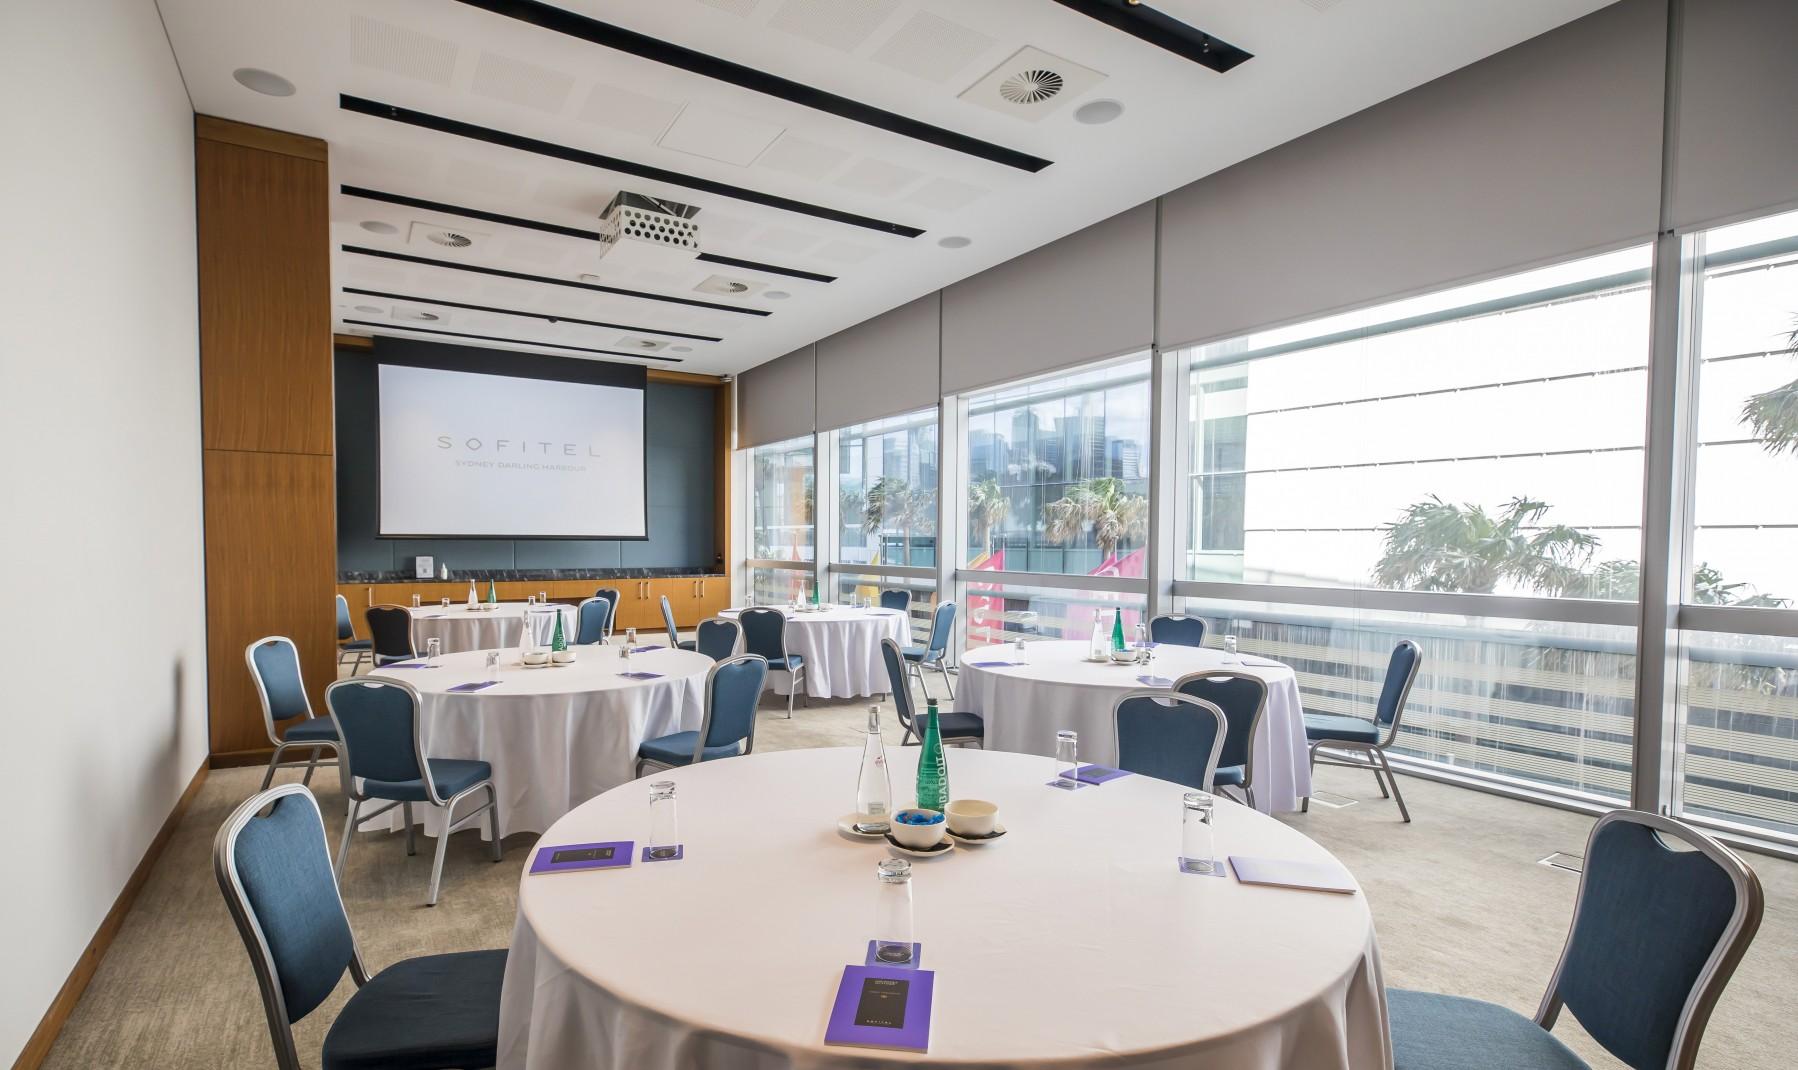 Sofitel-Sydney-Darling-Harbour-Murphy-Room-2c.jpg